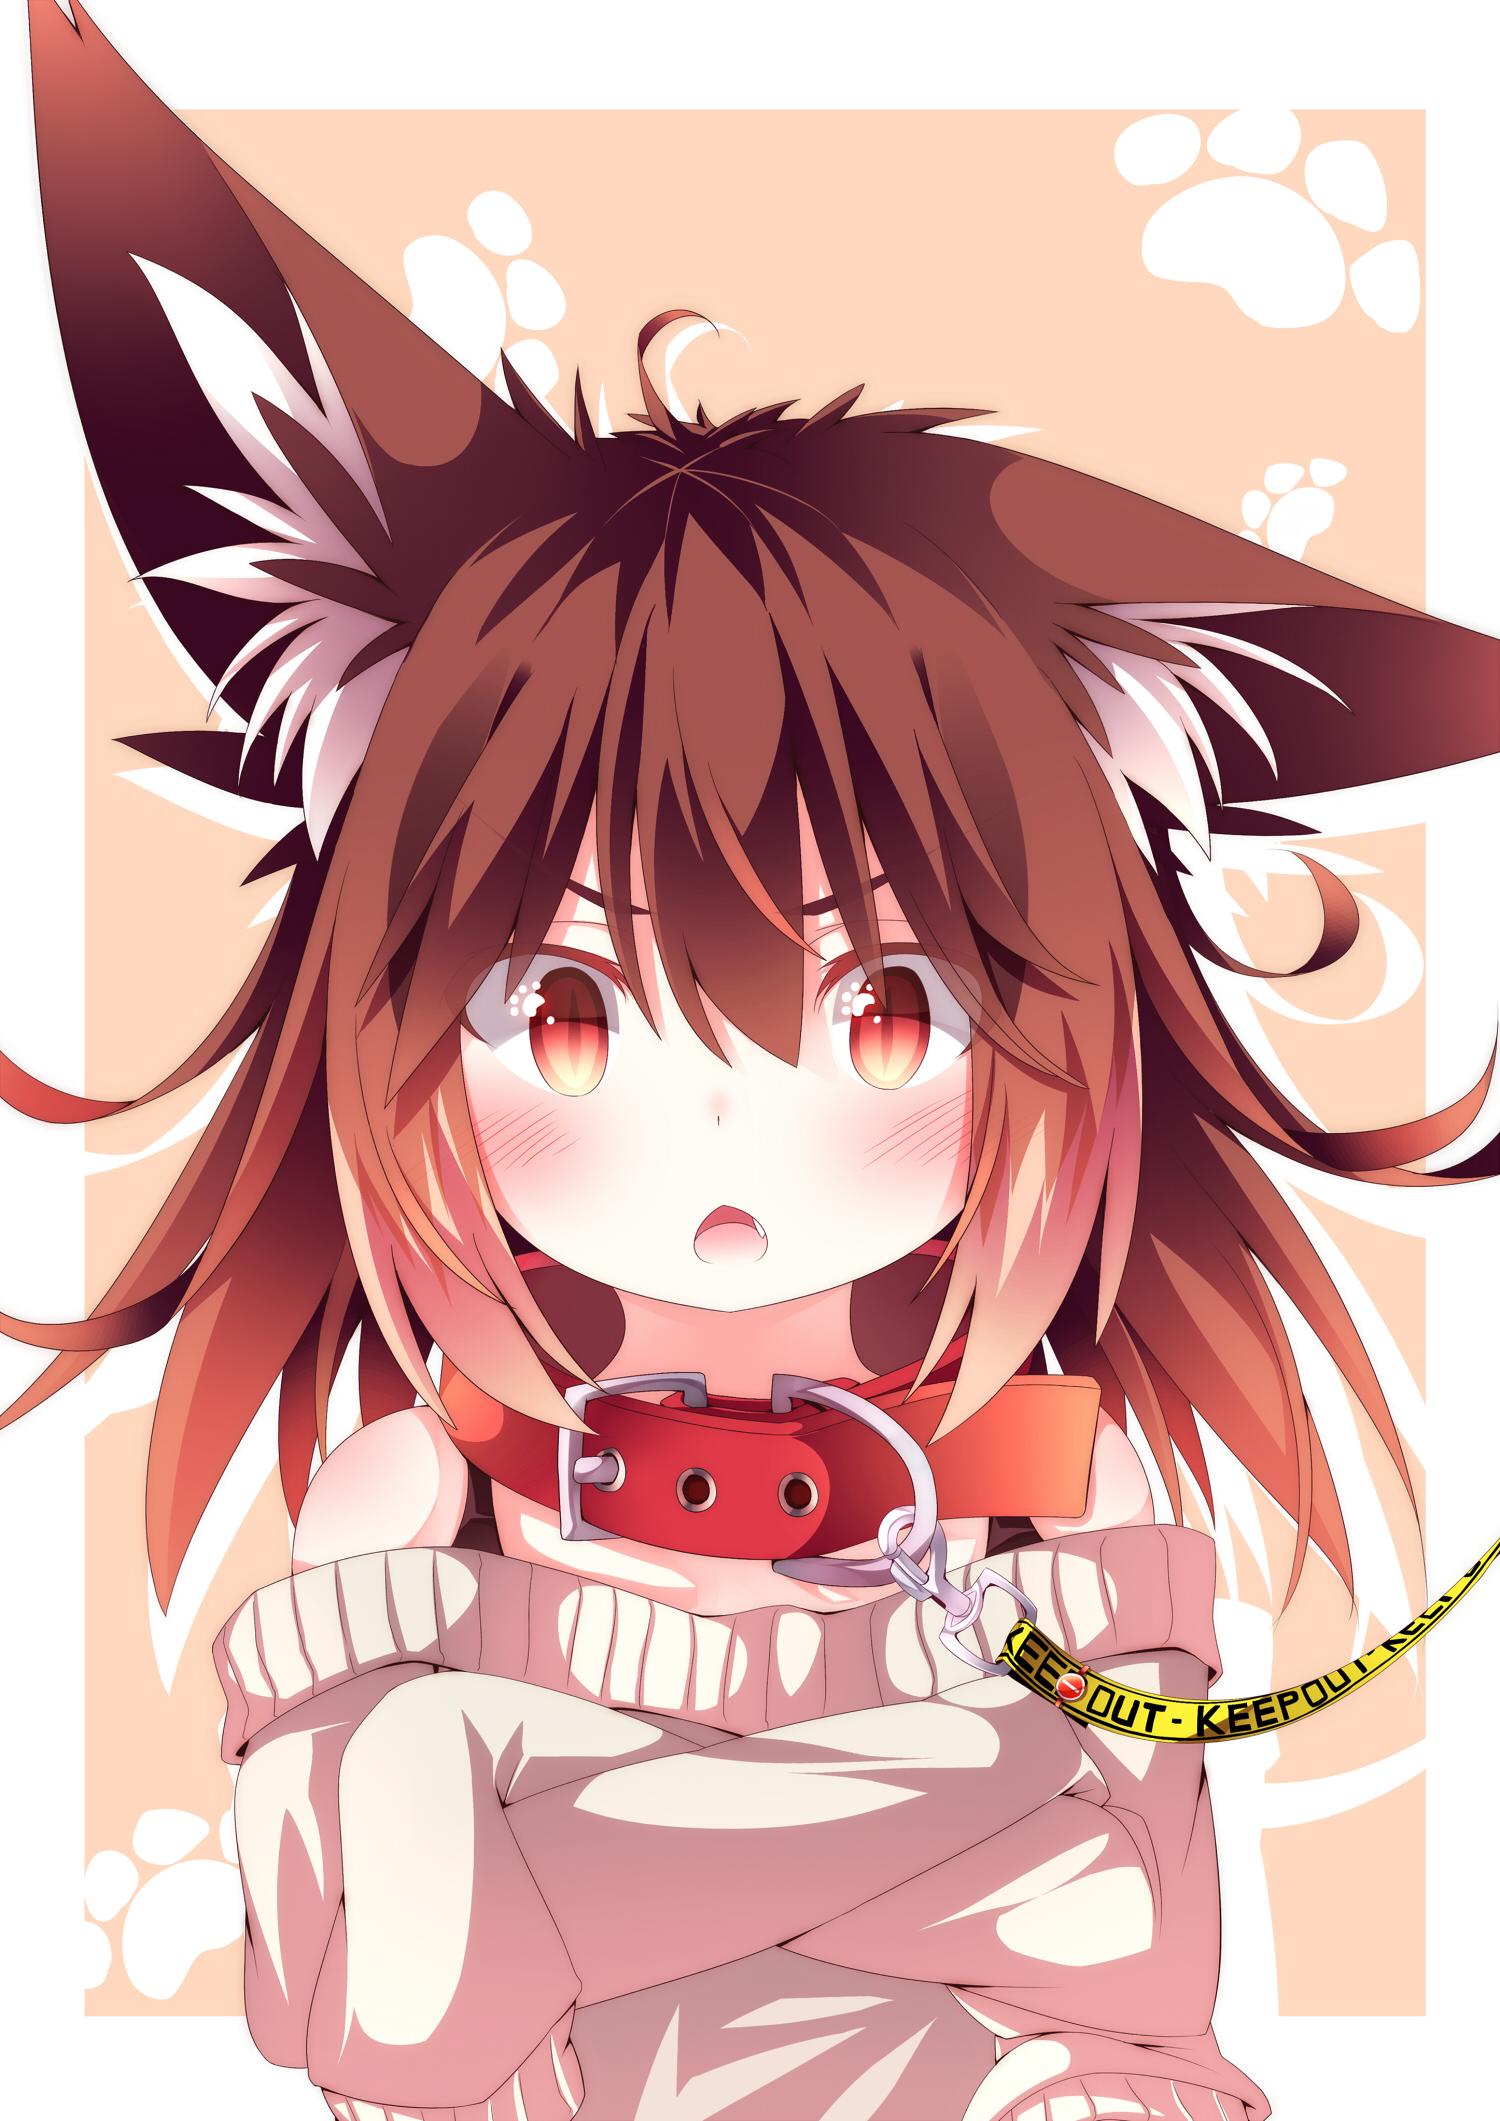 Daidai Ookami Orange Wolf Image 1797494 Zerochan Anime Image Board